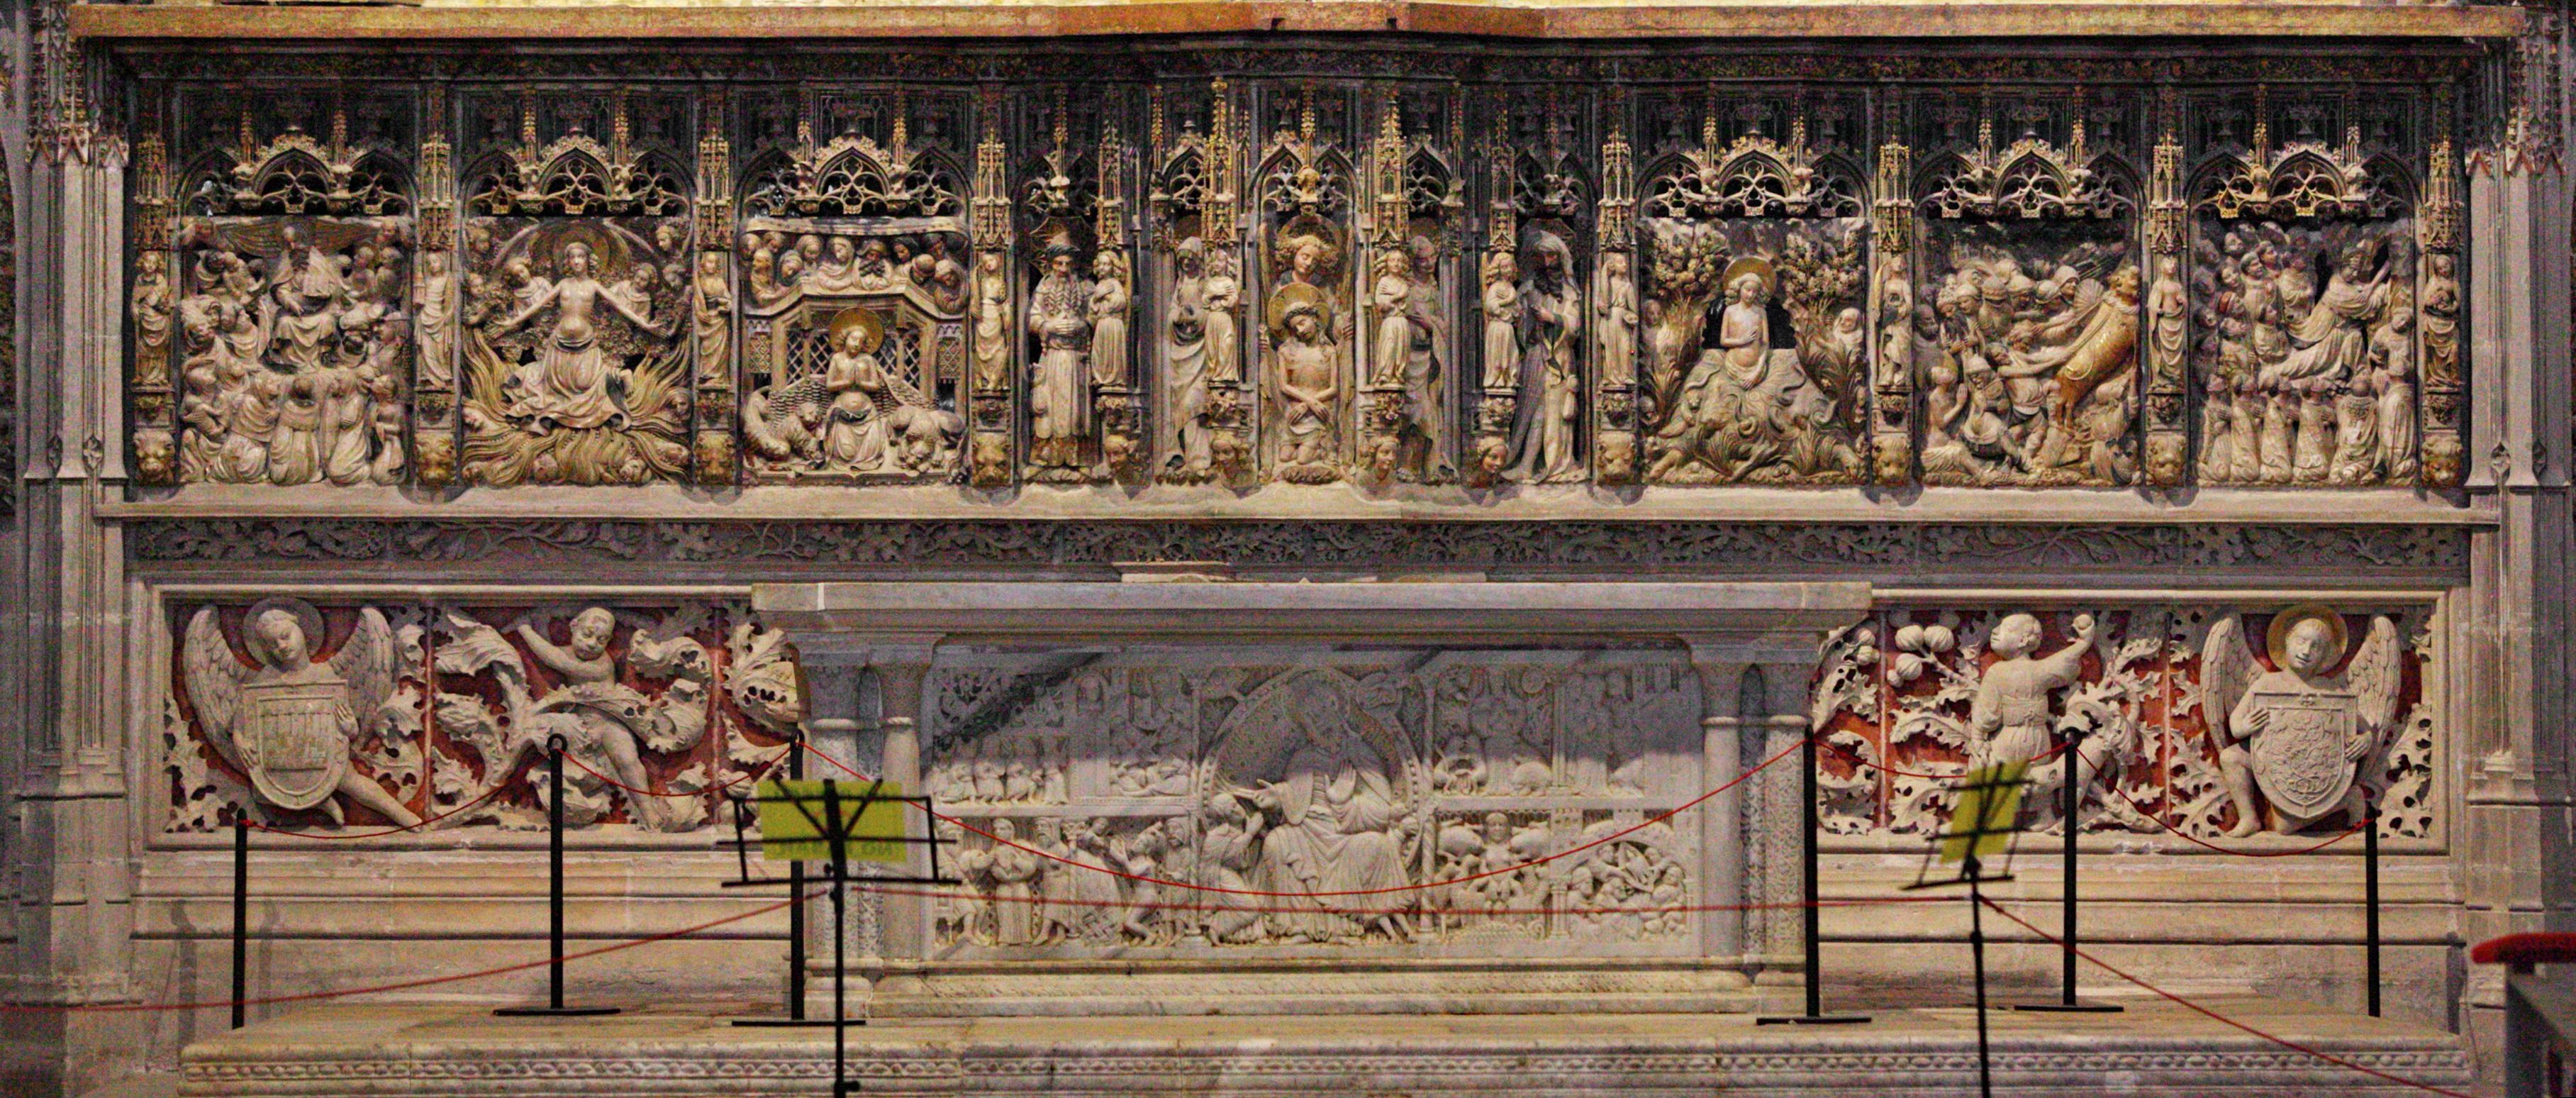 https://upload.wikimedia.org/wikipedia/commons/9/94/Catedral_Tarragona_AltarMajor_Pere_Joan_0029.jpg